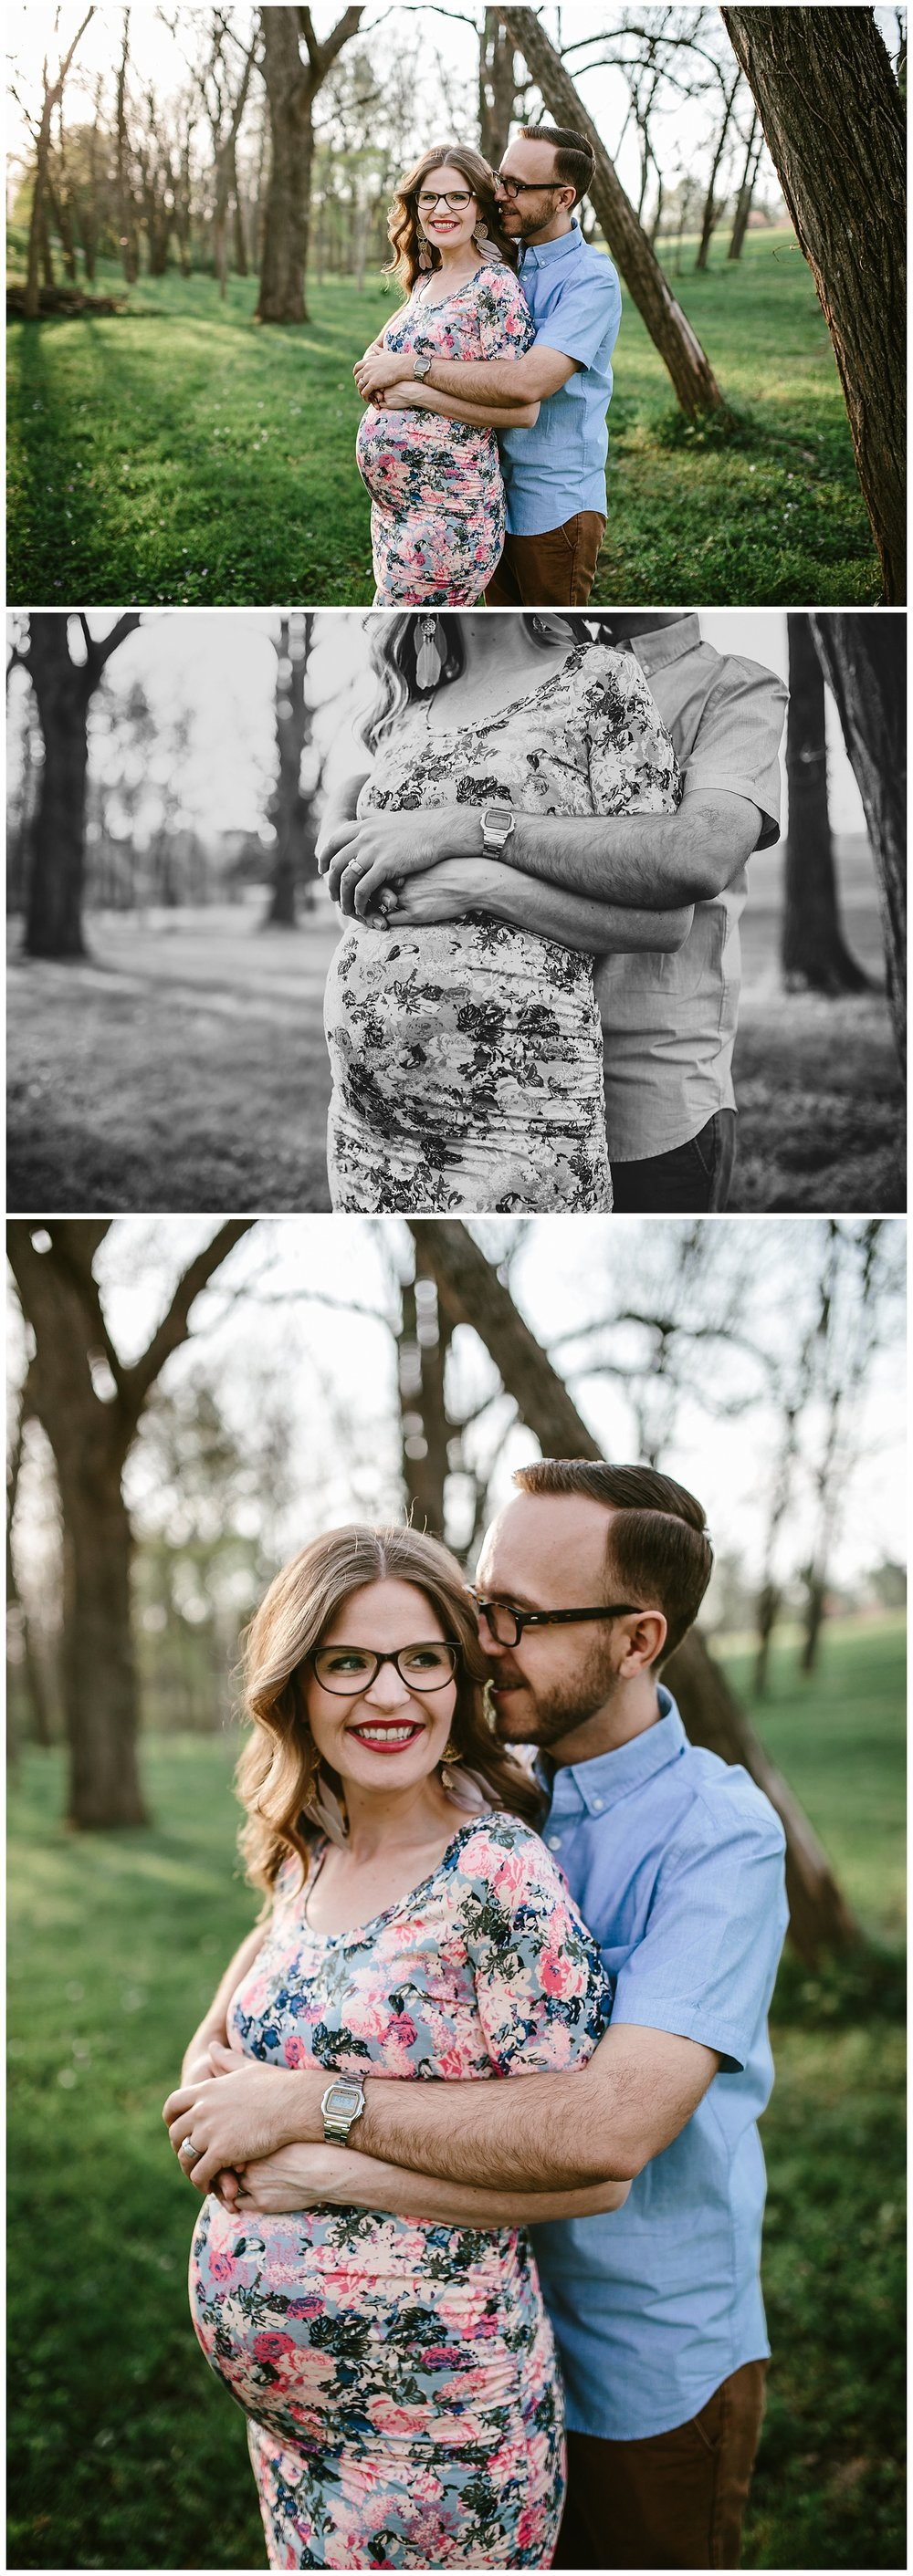 lifestlye maternity photographers springfield mo.jpg